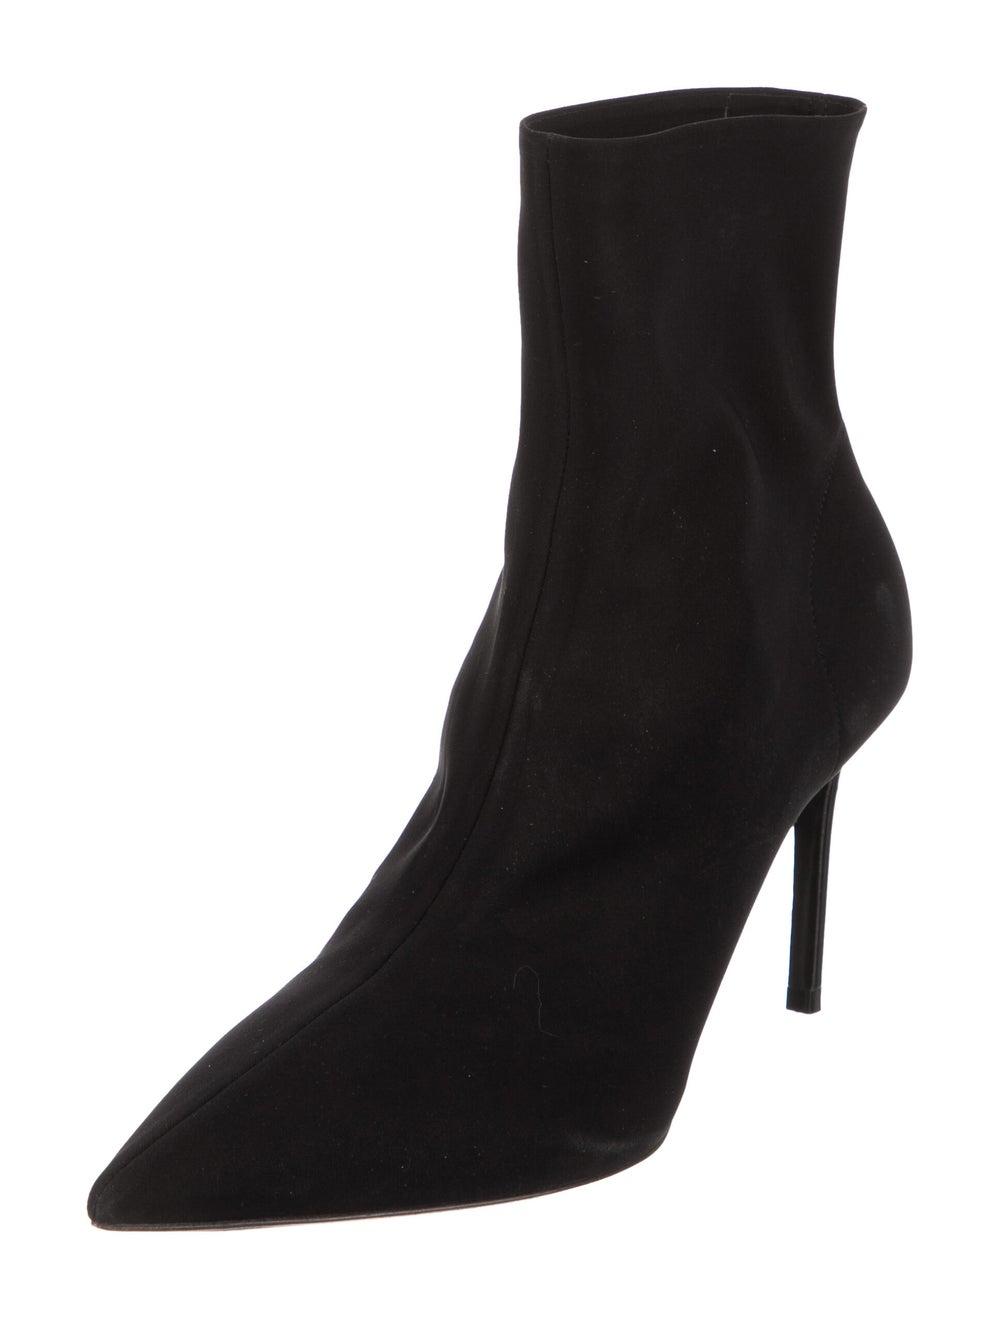 Prada Sock Boots Black - image 2